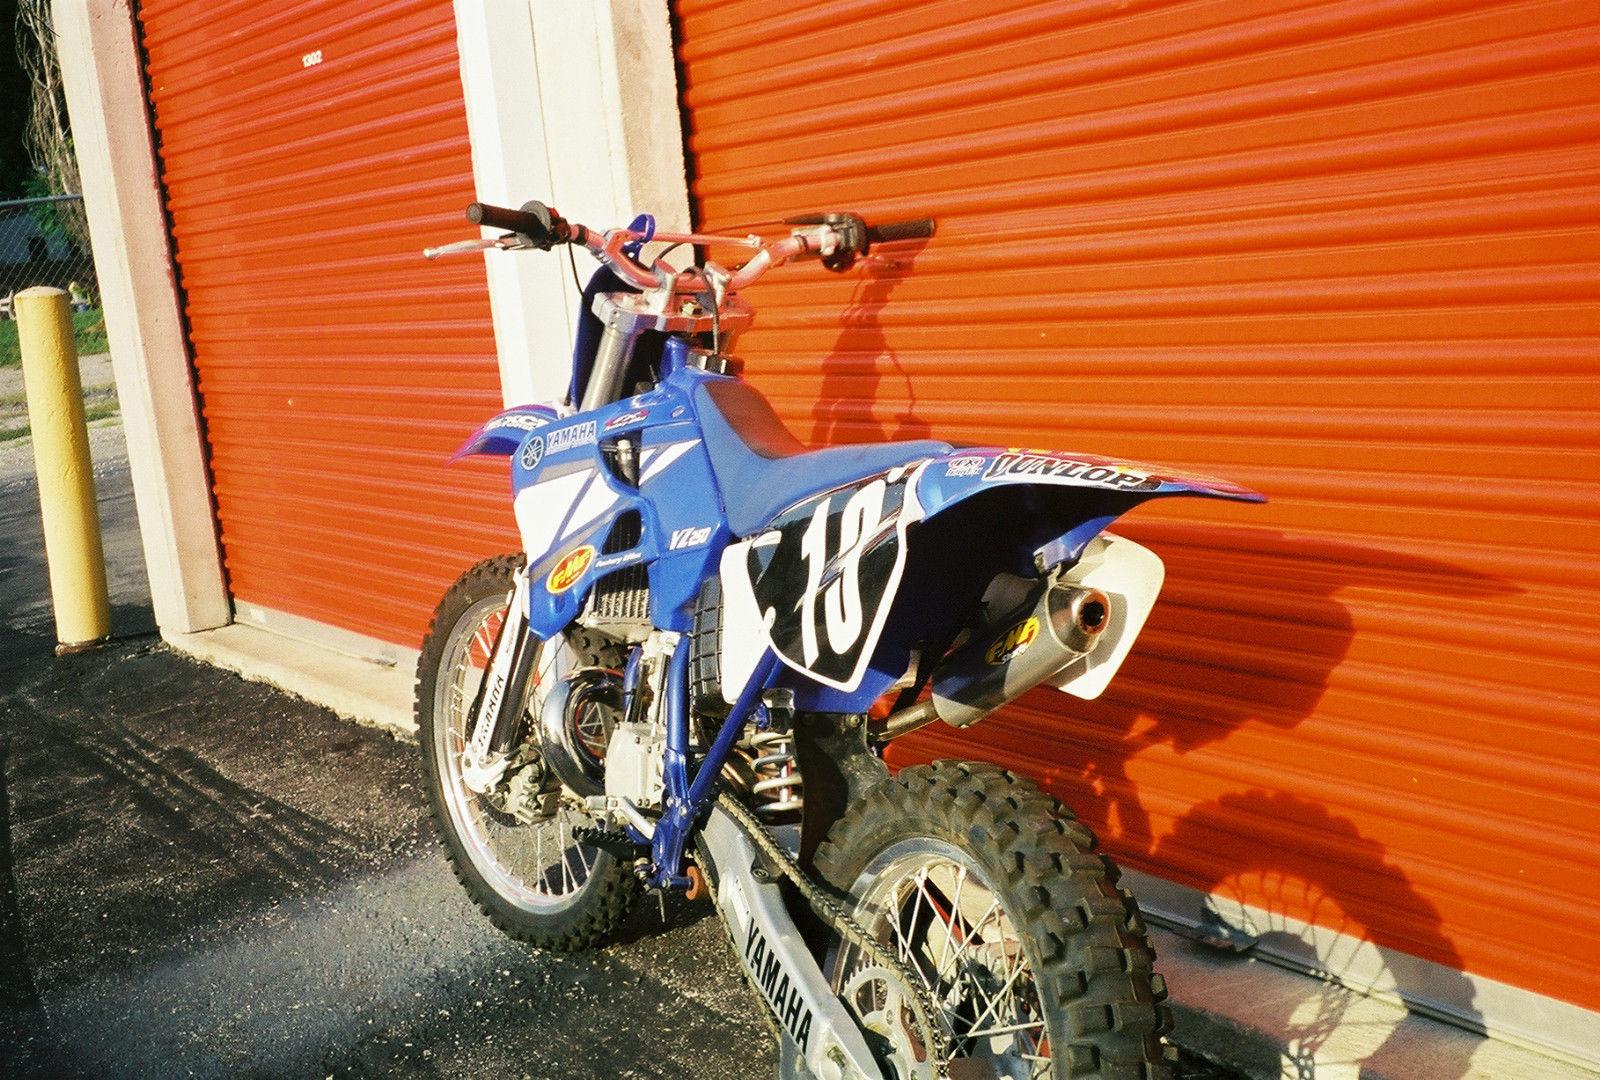 2001 Yamaha YZ 250 for Sale in Elkhead, Missouri